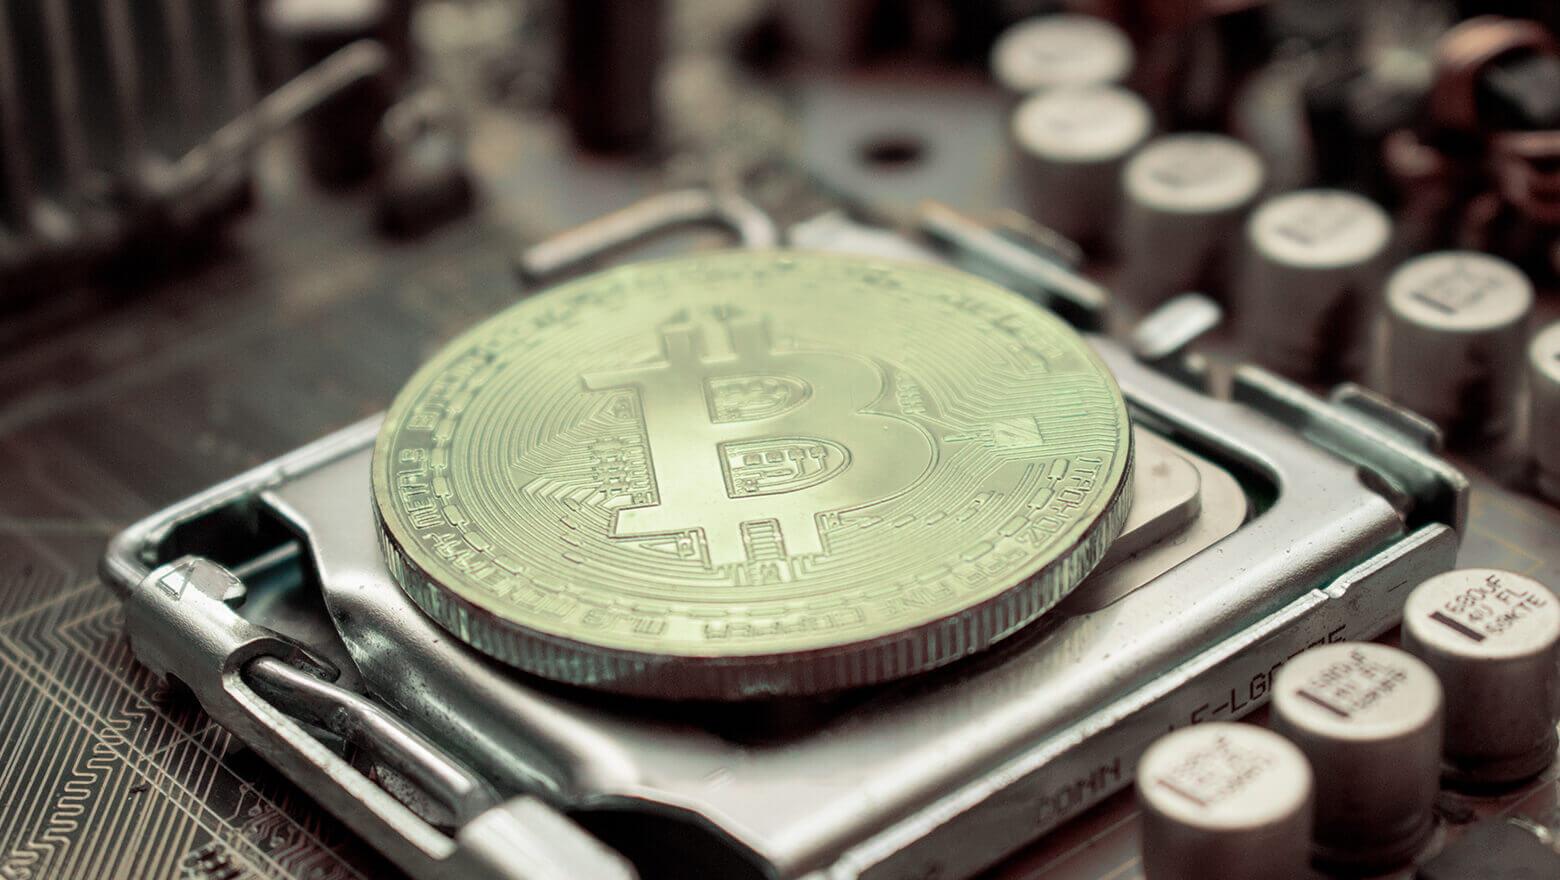 Business improvement analyst mining bitcoins betfair lay betting explained